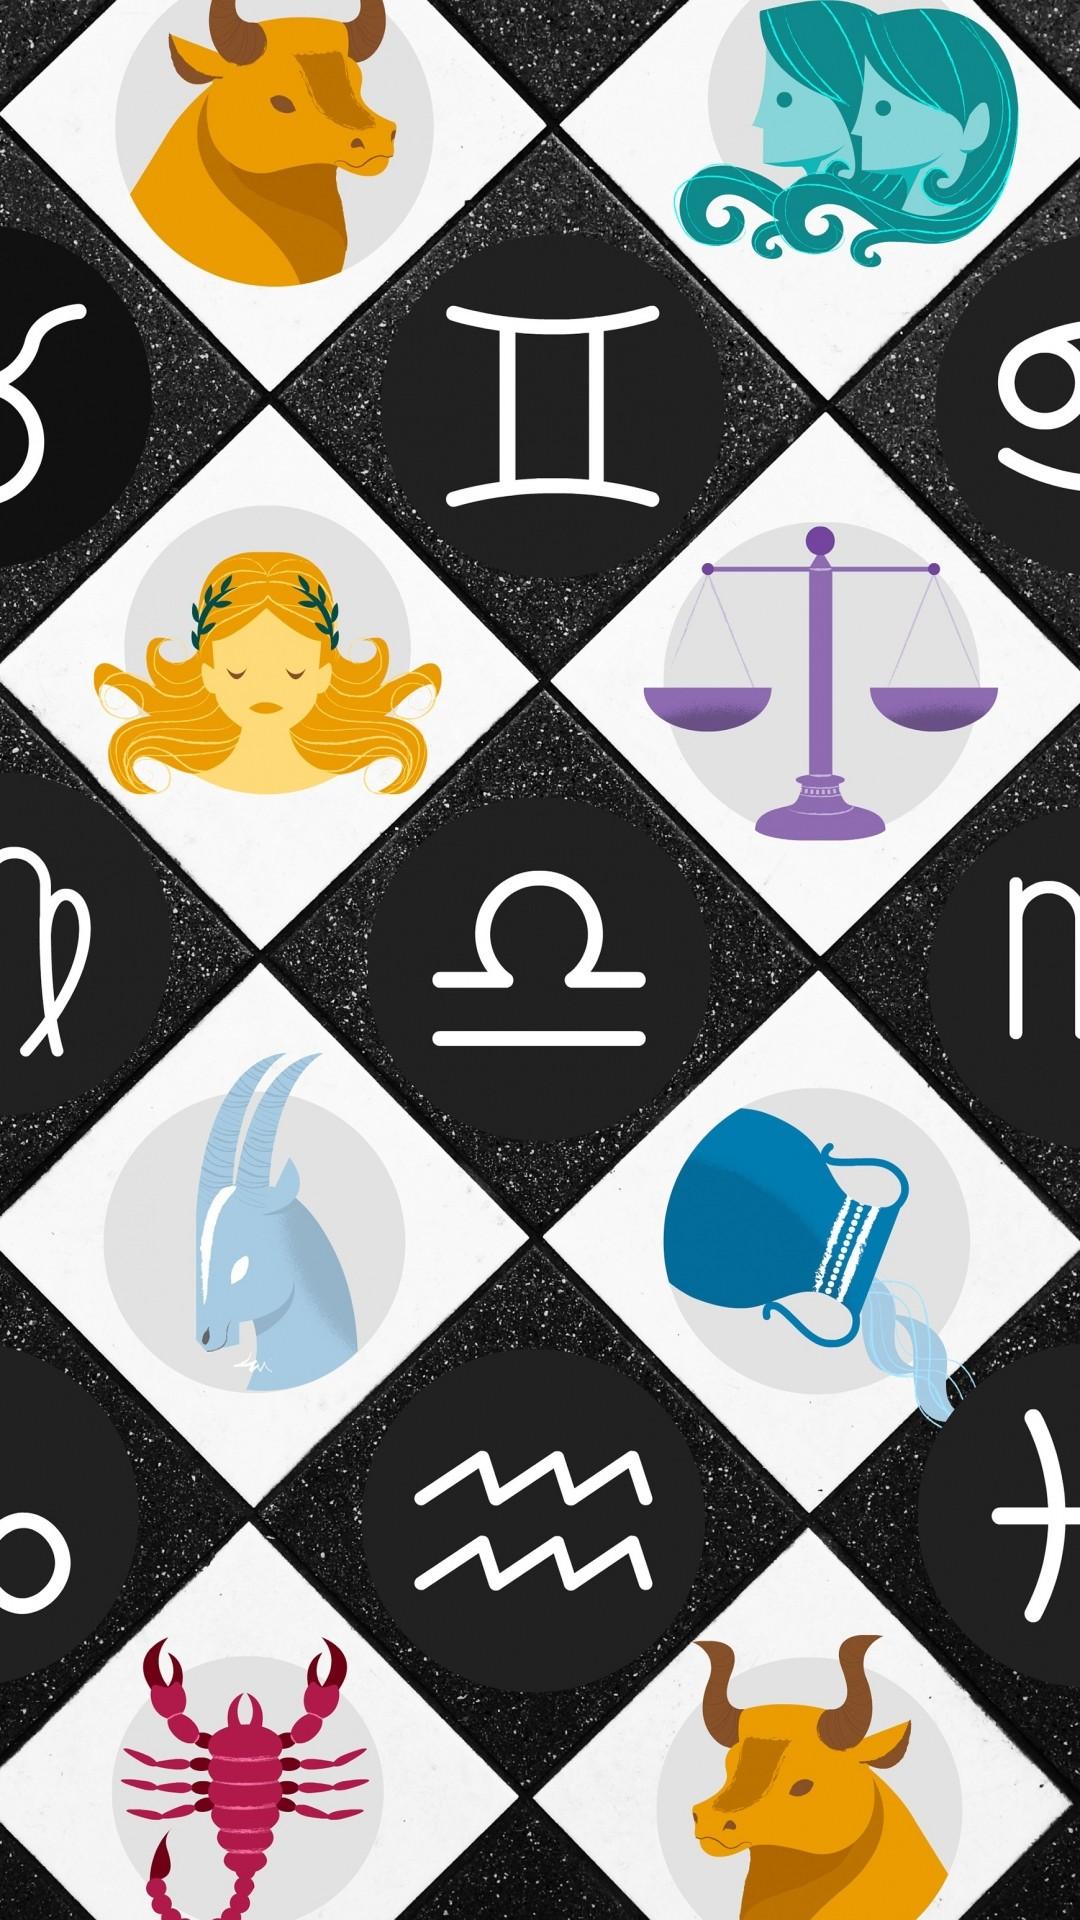 Free Zodiac signs phone wallpaper by juslovinmybabies